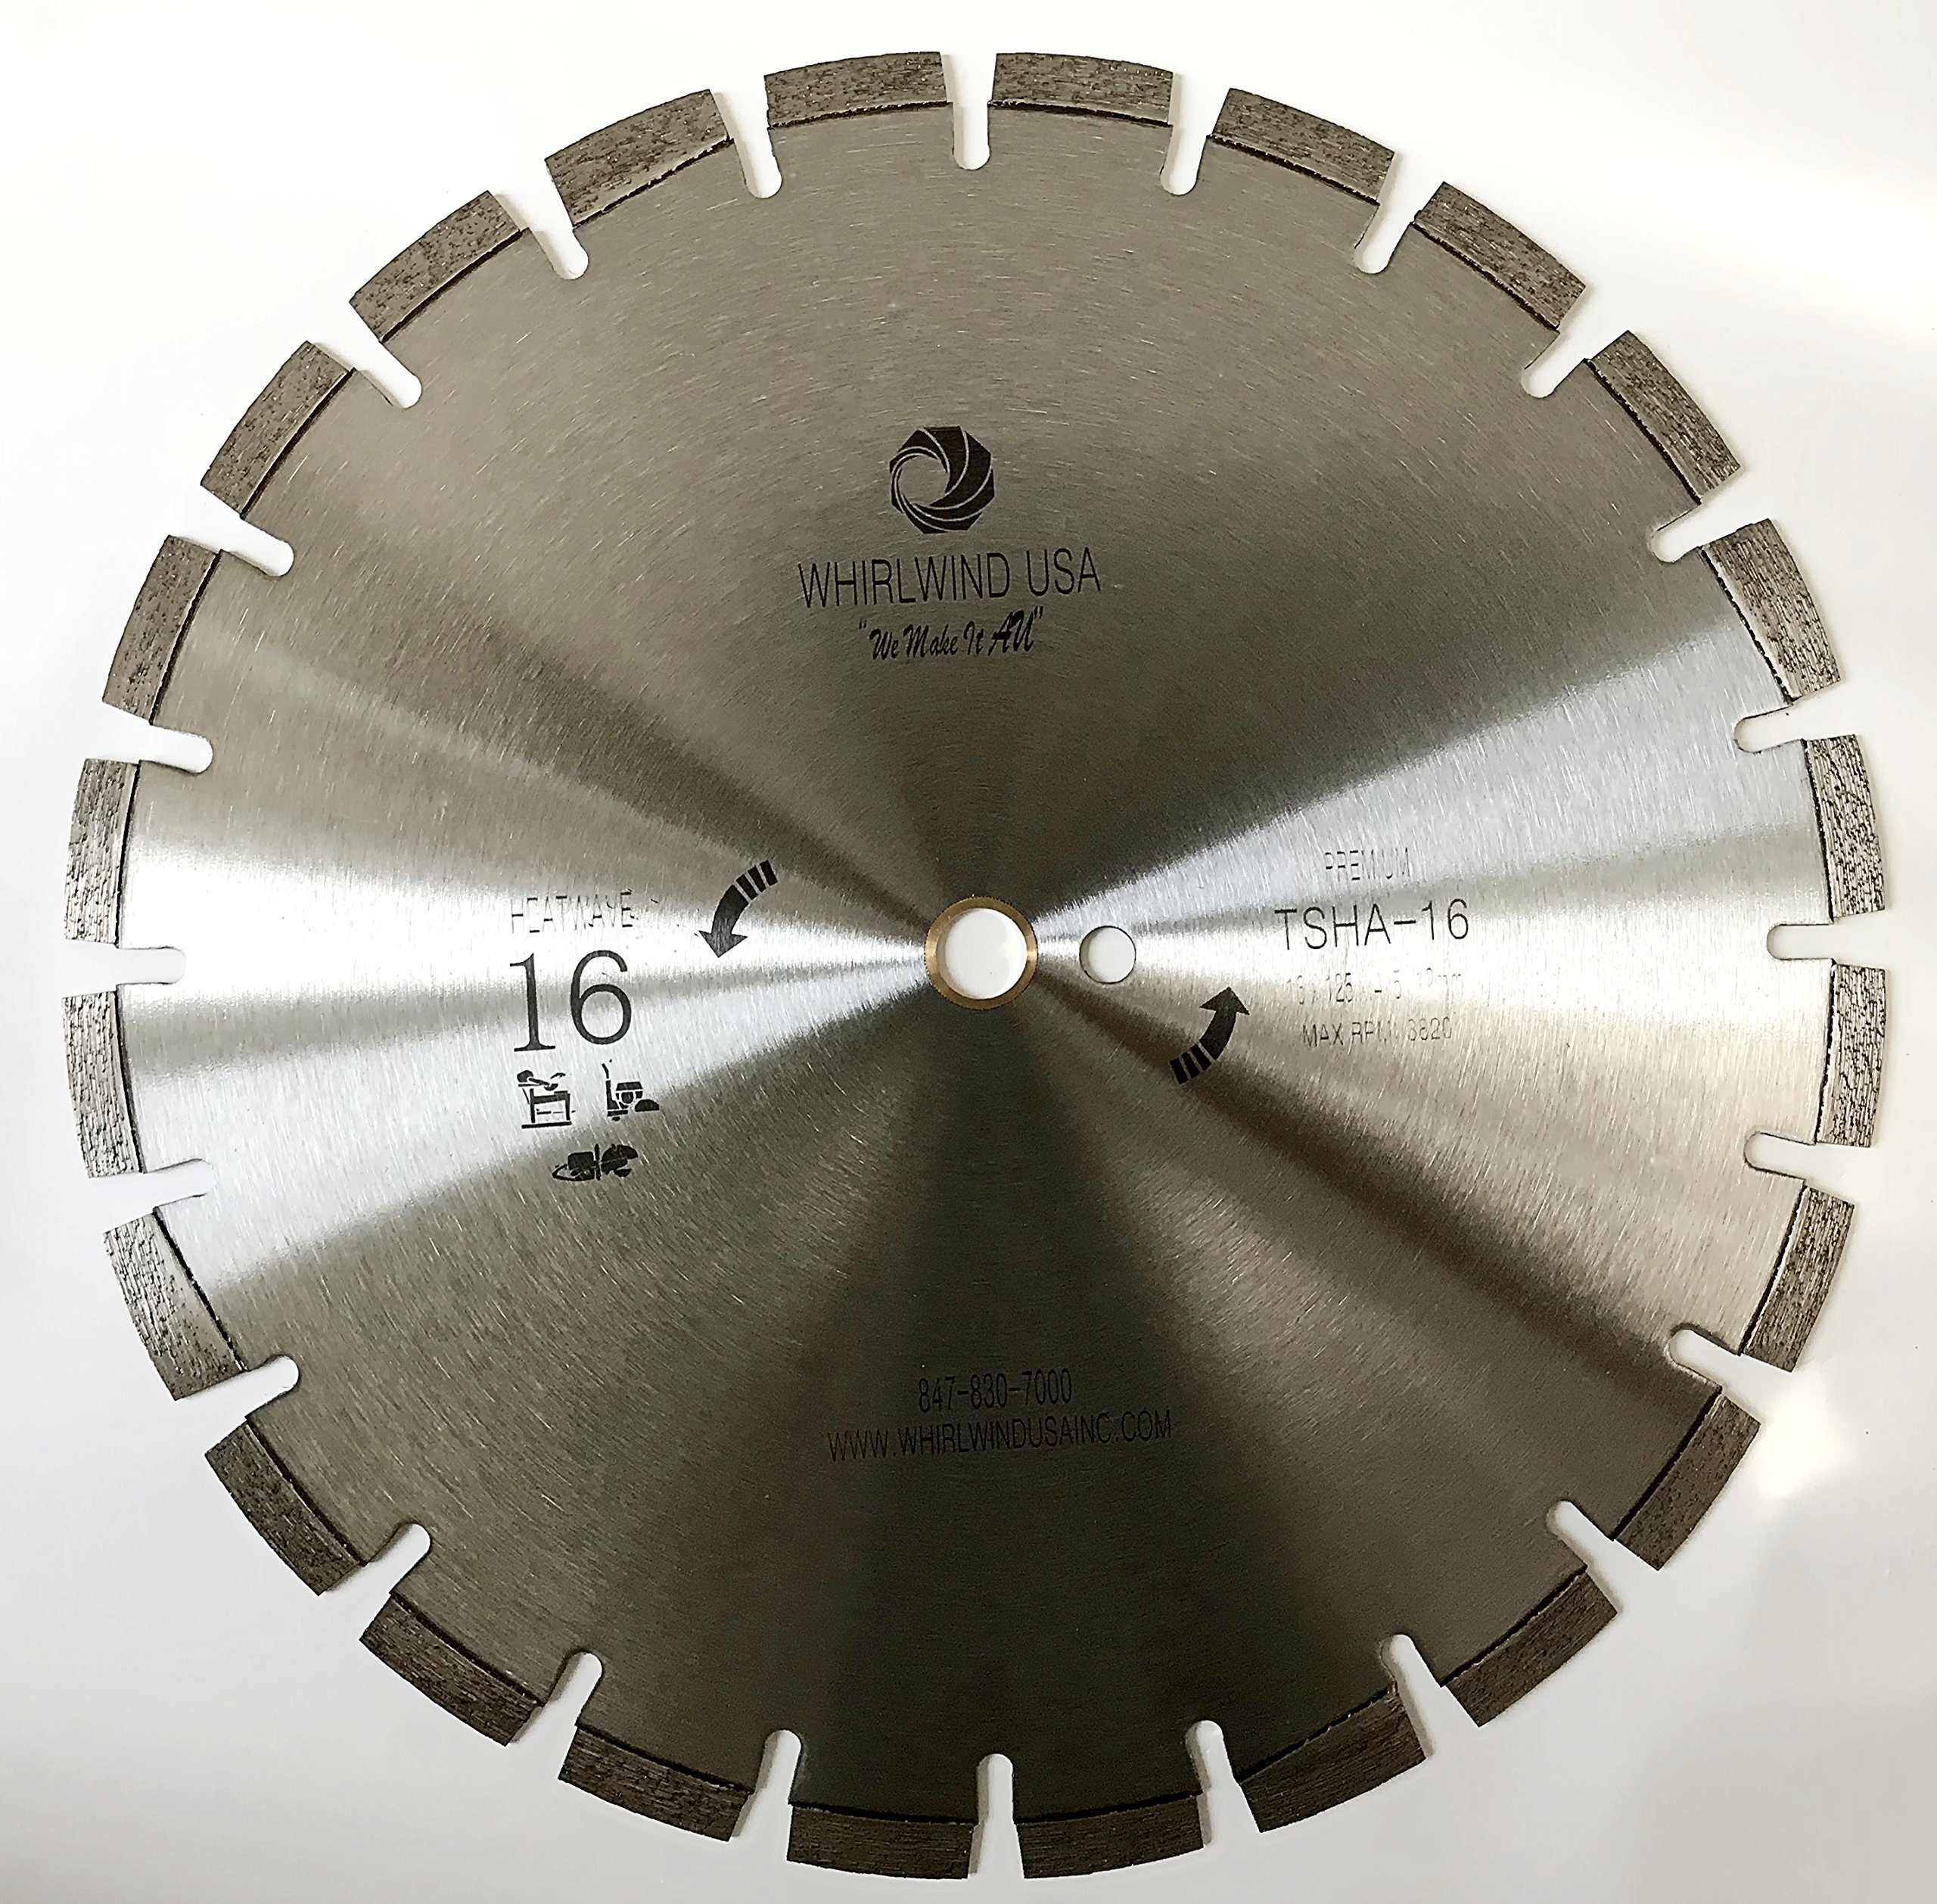 Whirlwind USA 16 inch Heatwave Dry Asphalt Cutting Laser Welded Segmented Diamond Saw Blades (16'')